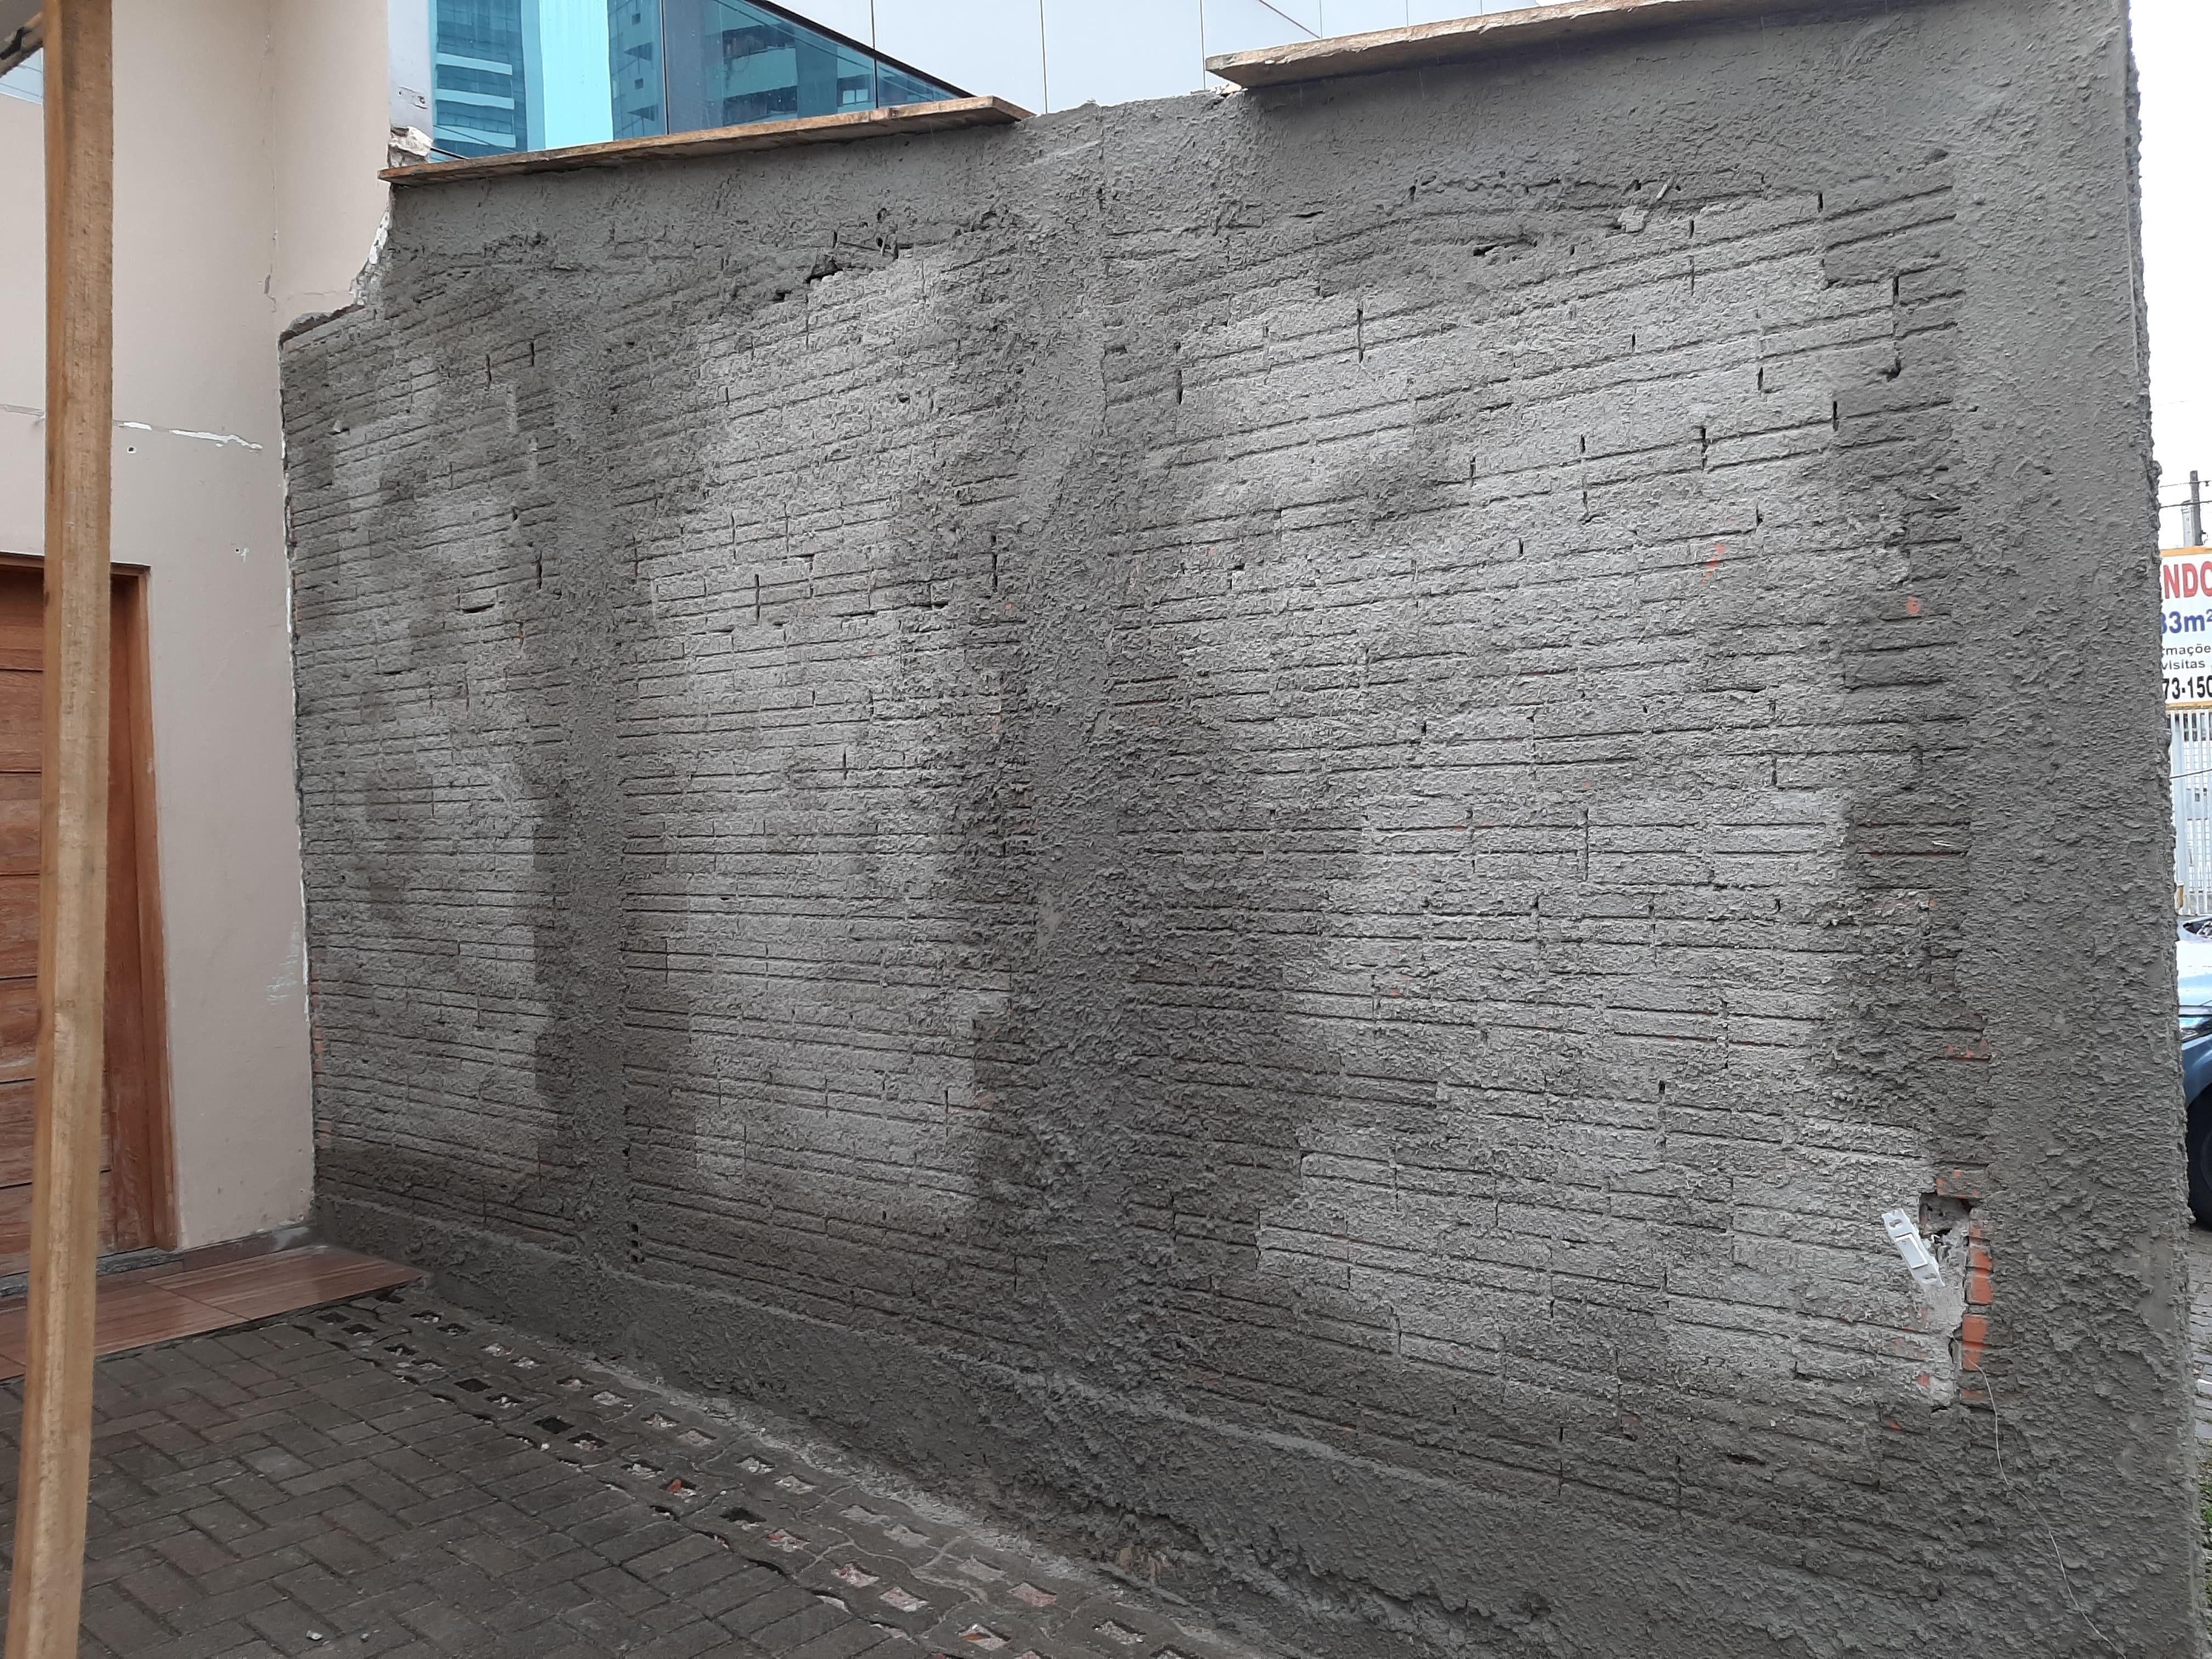 Muro Hermes - Fecci Engenharia - 10-min.